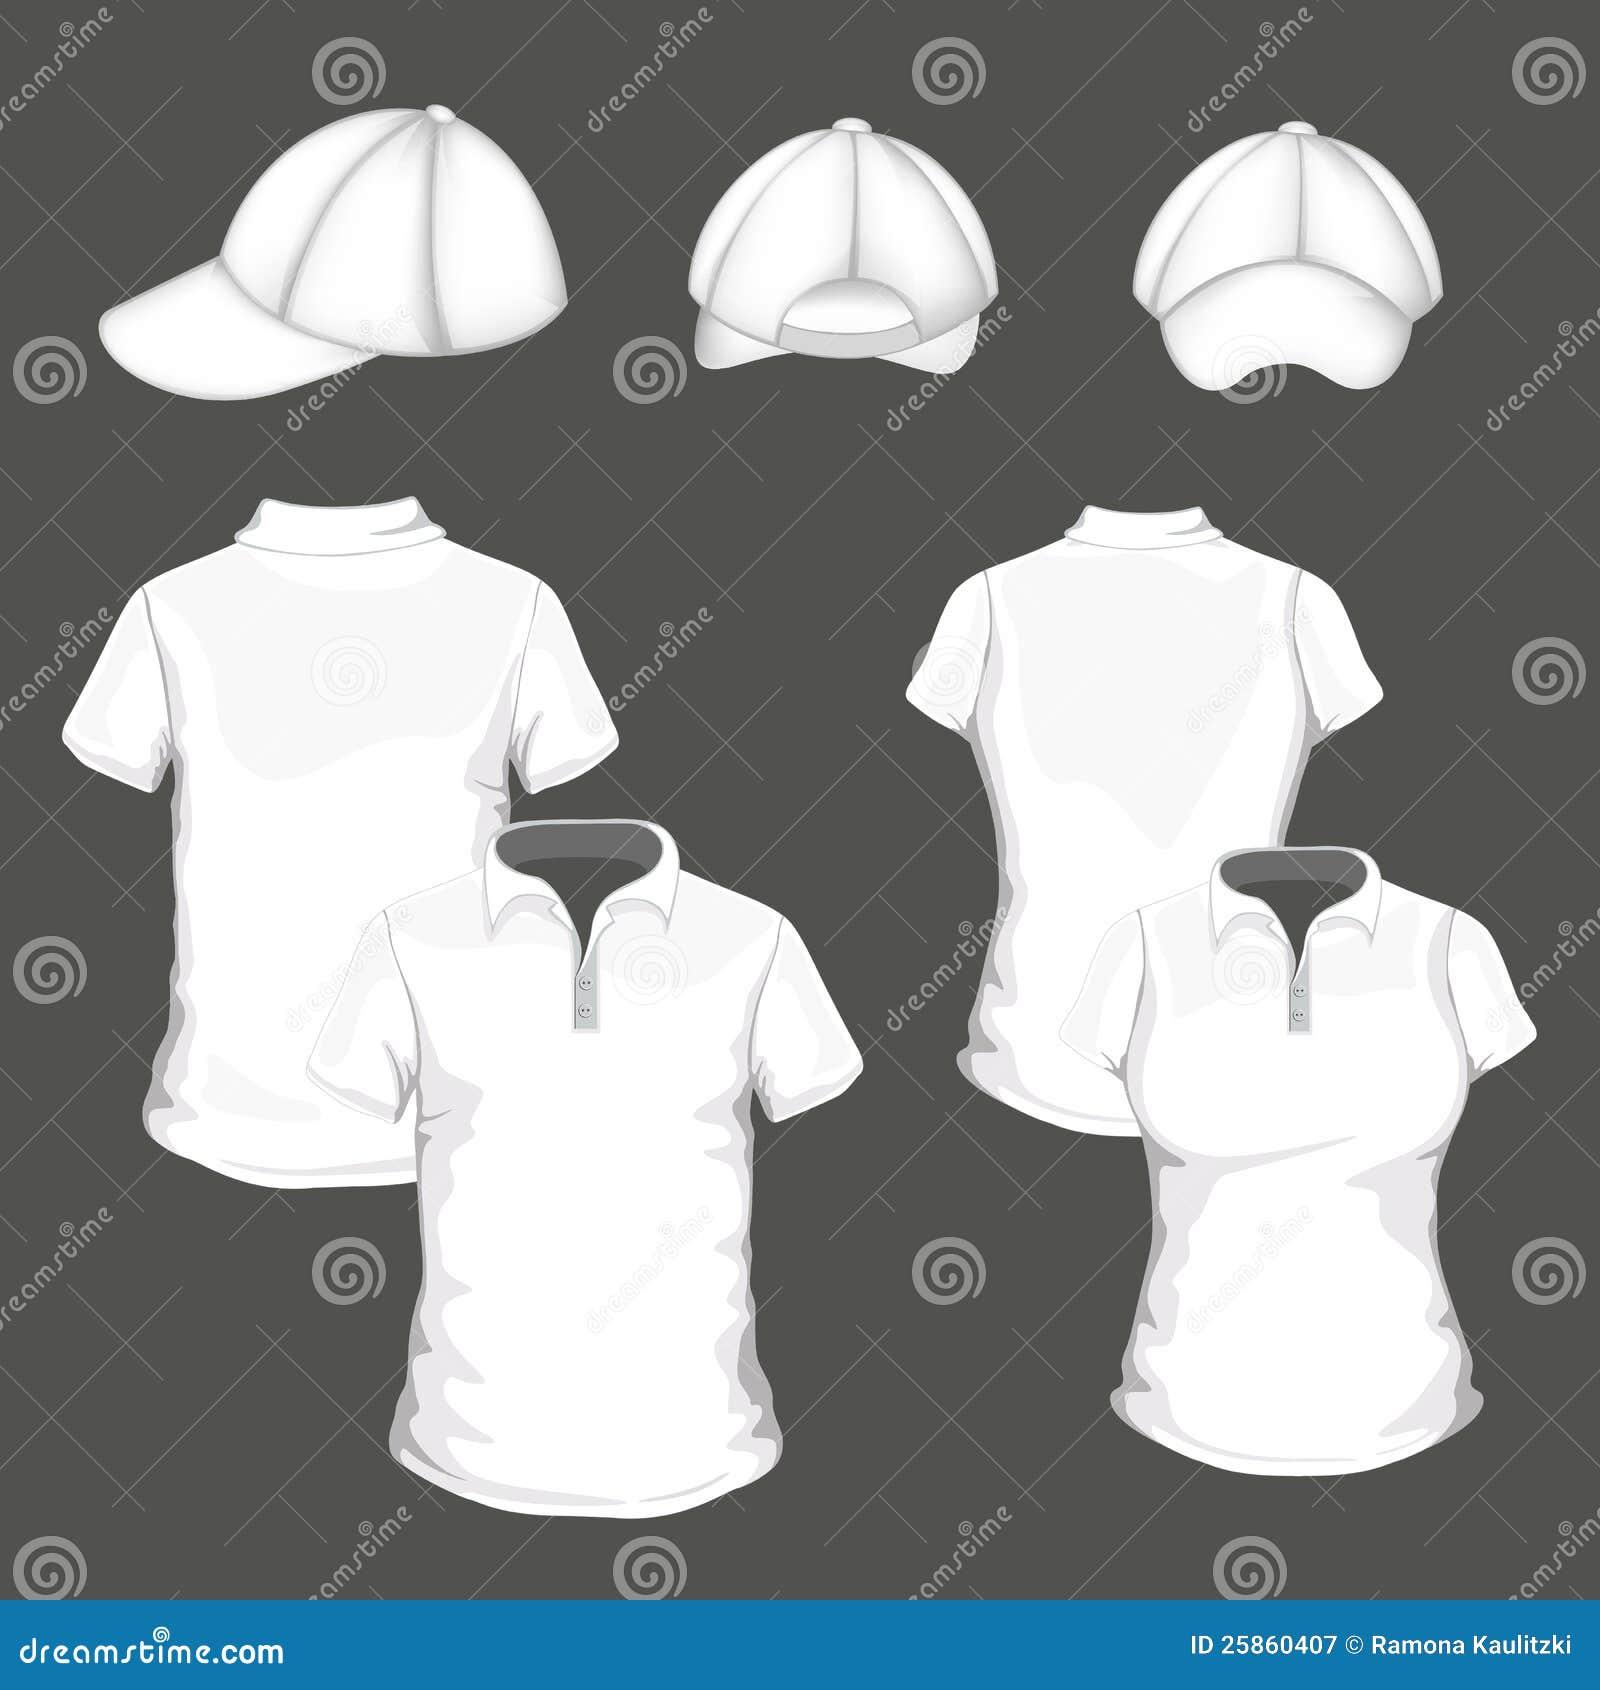 Set With Polo Shirt An Baseball Cap Templates Royalty Free